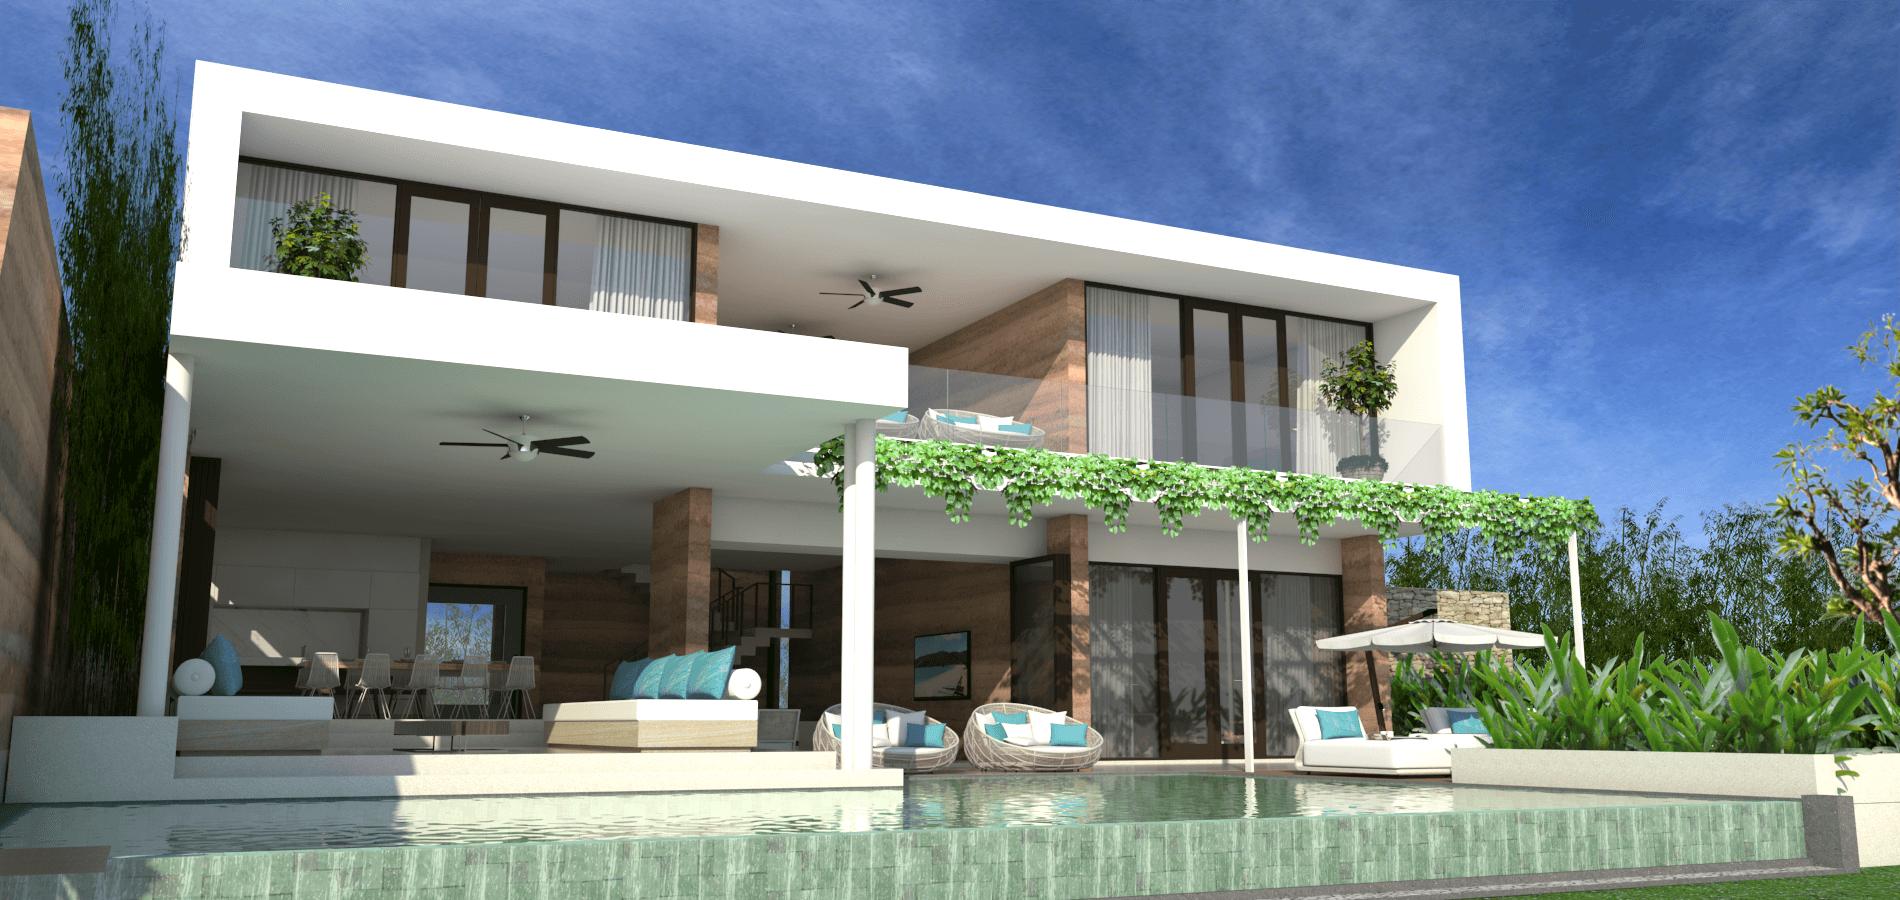 Pt. Indodesign Kreasi Mandiri Damai Indah Villas Lombok Bali, Indonesia Bali, Indonesia Beachfront-Suite   8612